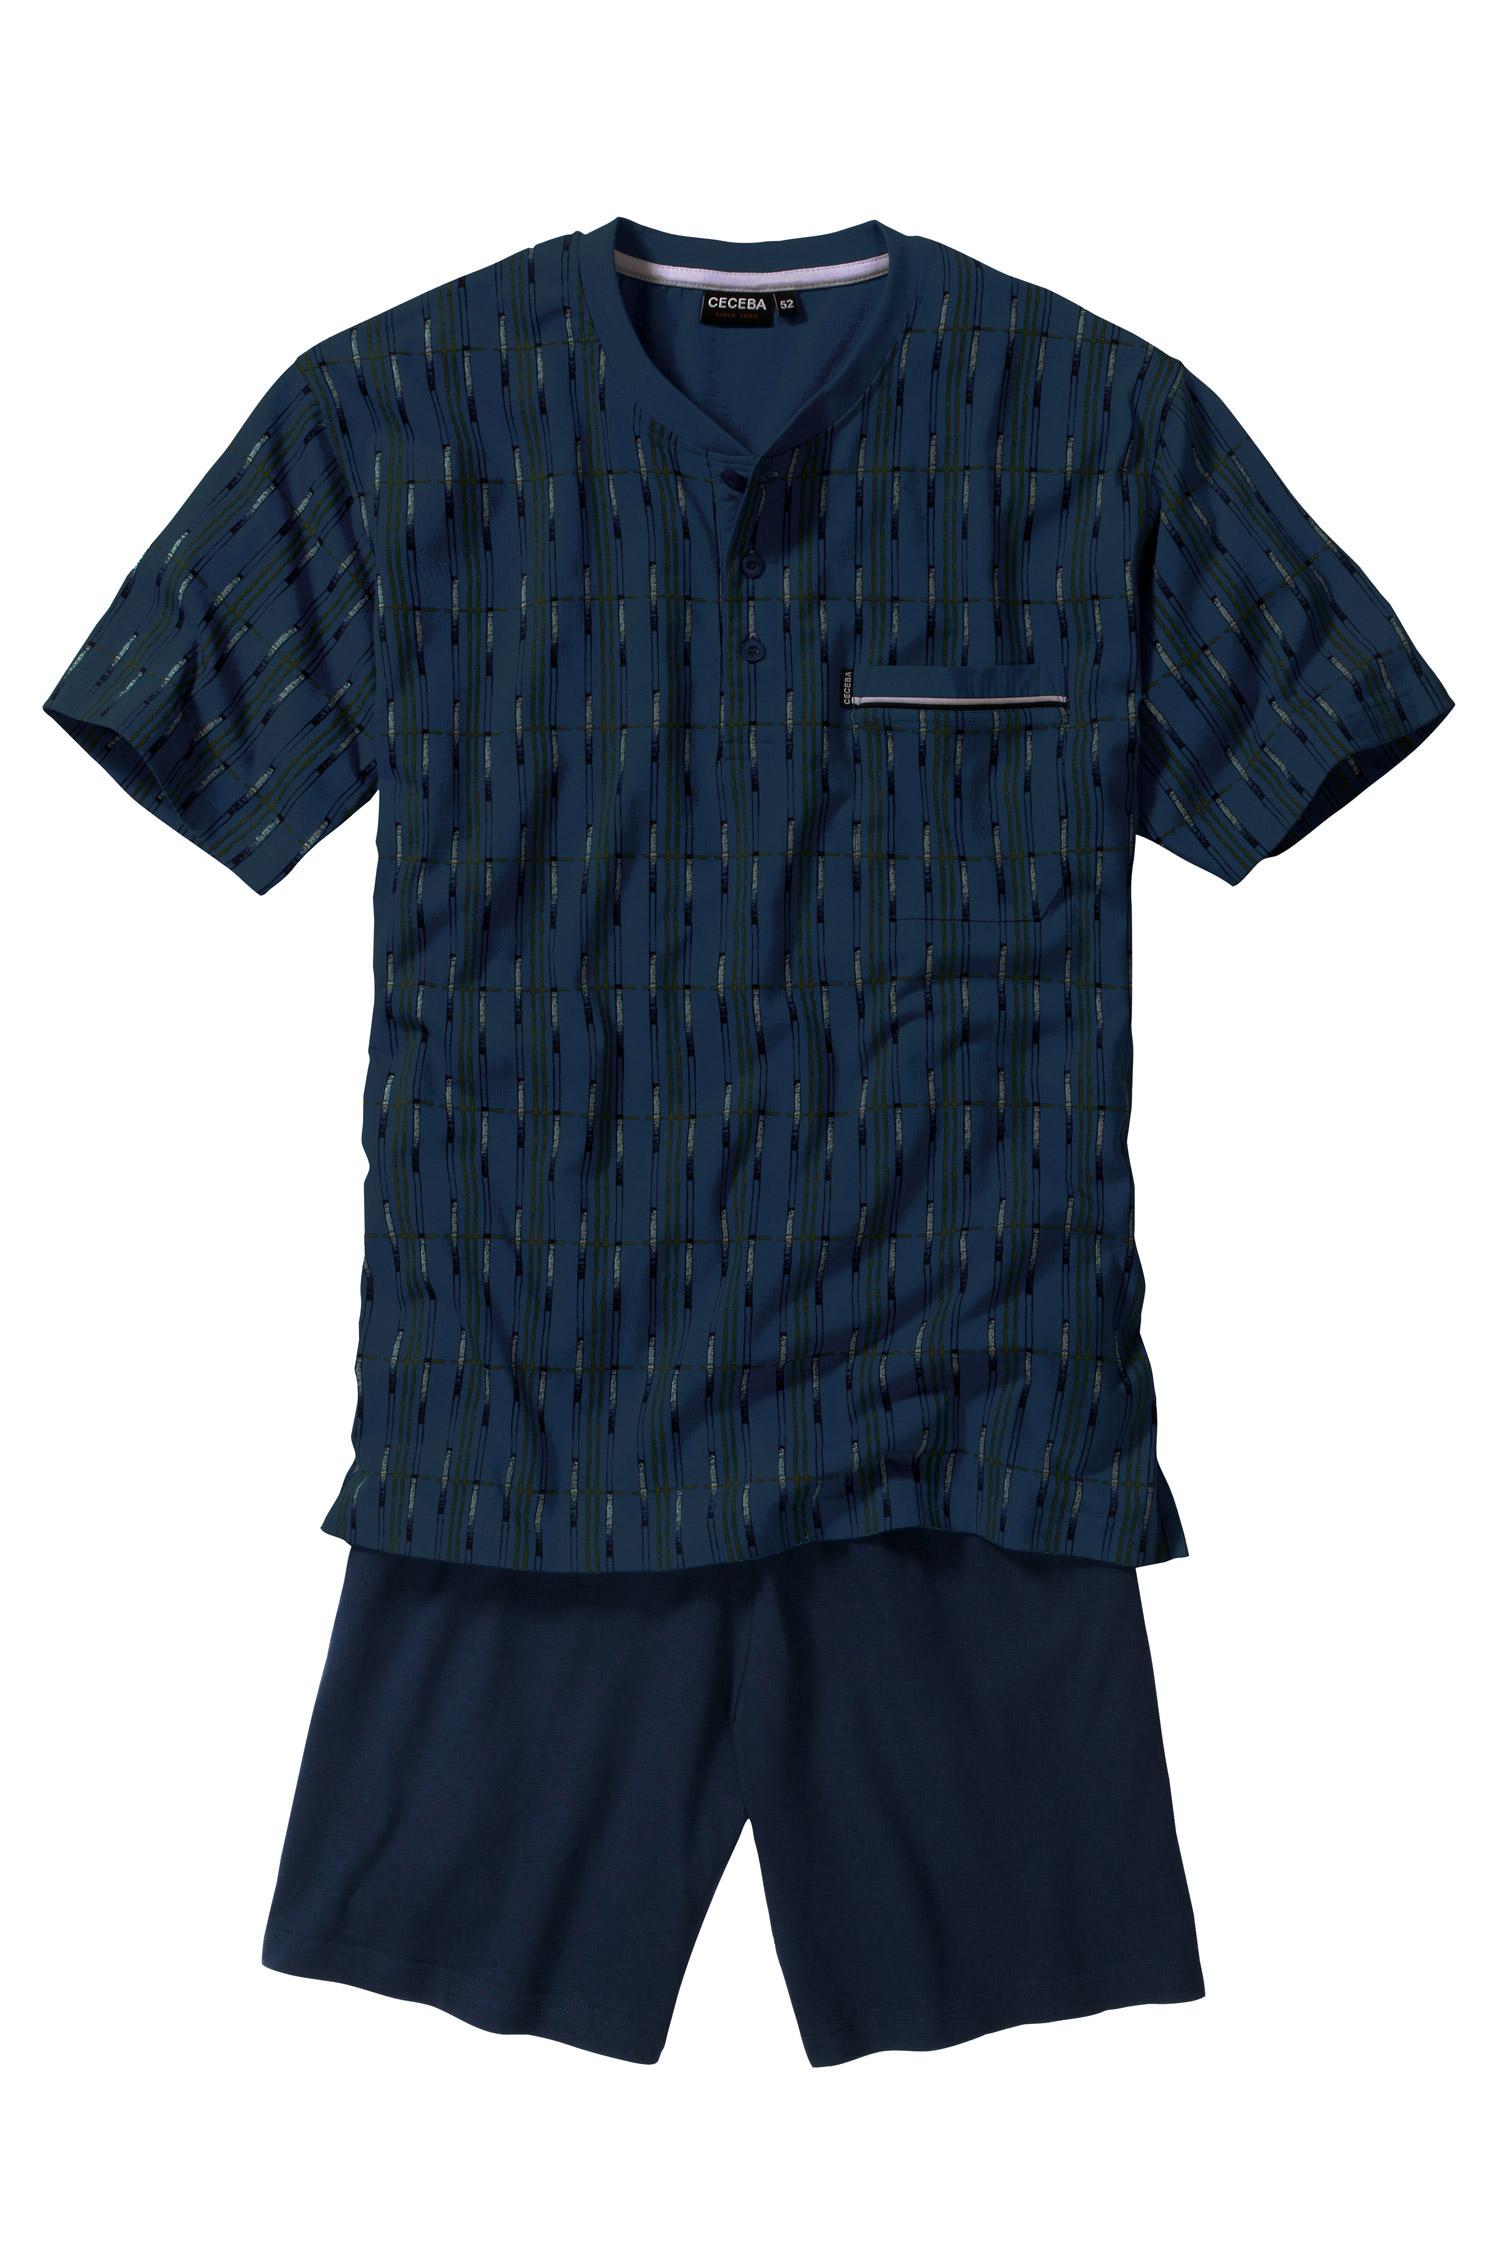 Homewear, Pijama M. Corta, 107114, ANTRACITA | Zoom